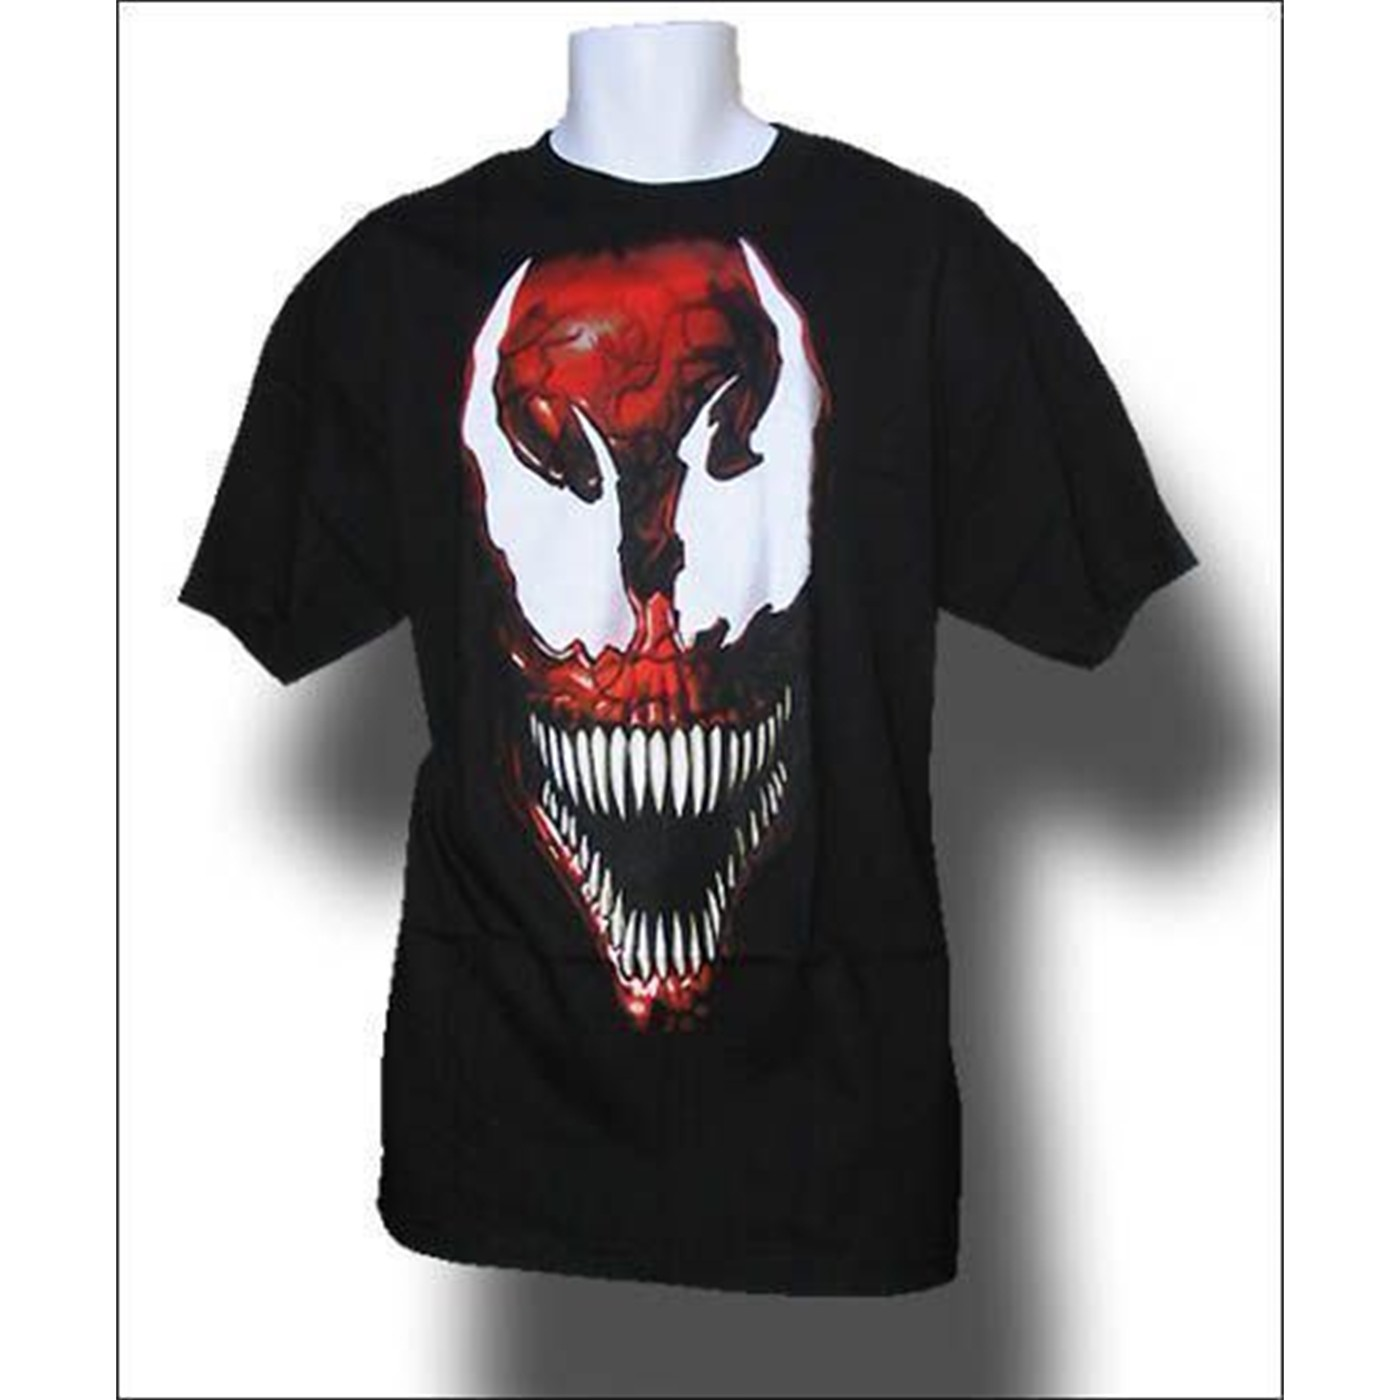 Carnage Face T-Shirt